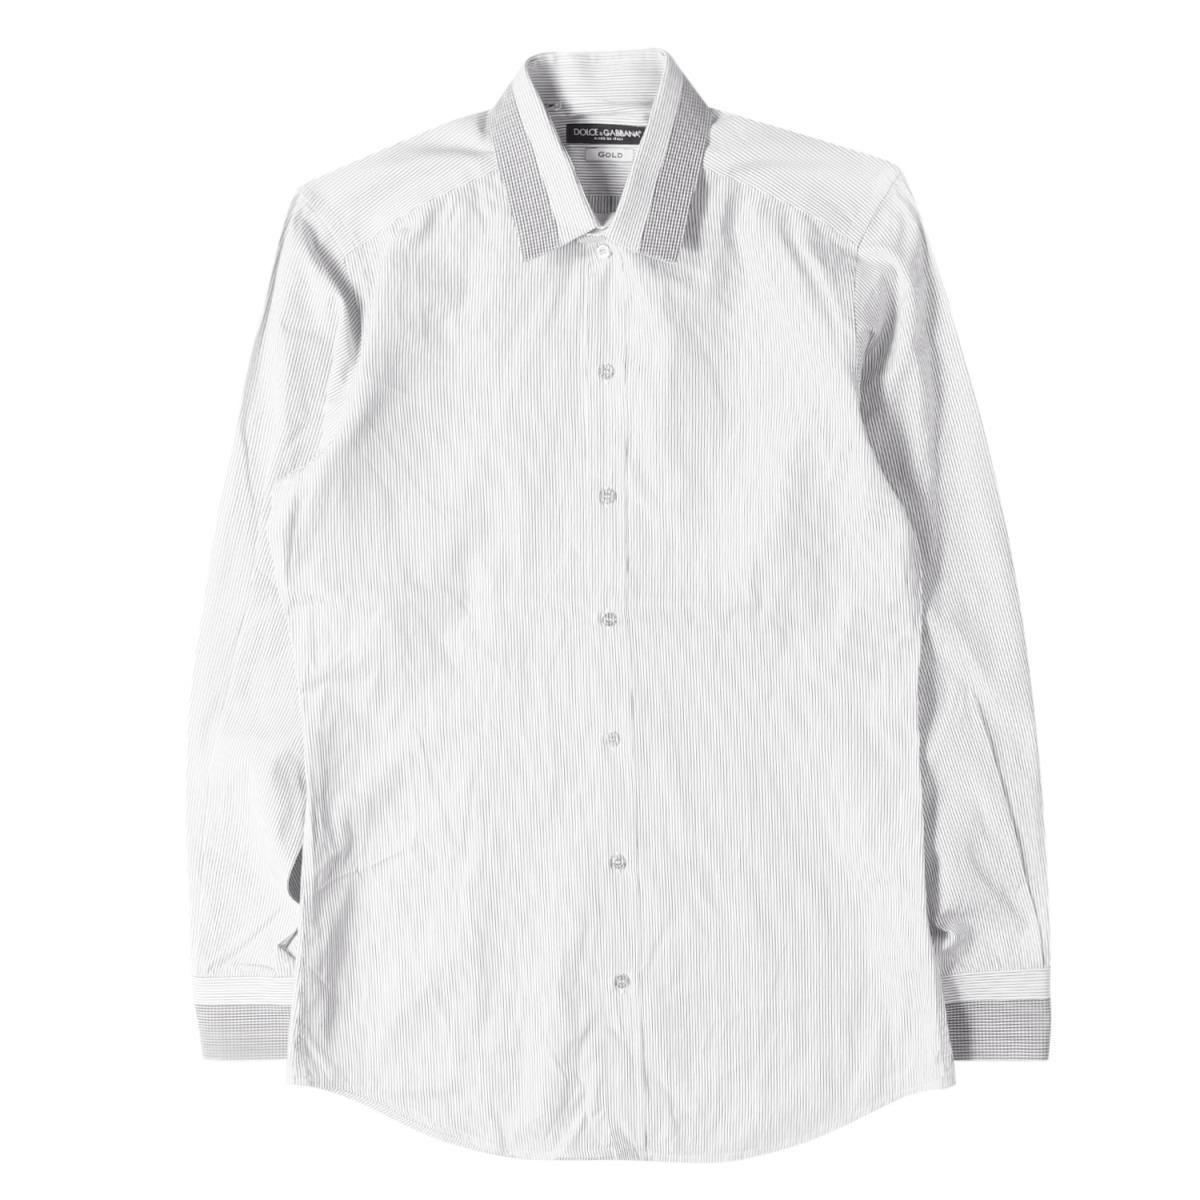 DOLCE&GABBANA (ドルチェ&ガッバーナ) チェックコンビストライプコットンドレスシャツ(GOLD) ホワイト×ブラック 15 1/2(39) 【メンズ】【中古】【K2368】【あす楽☆対応可】